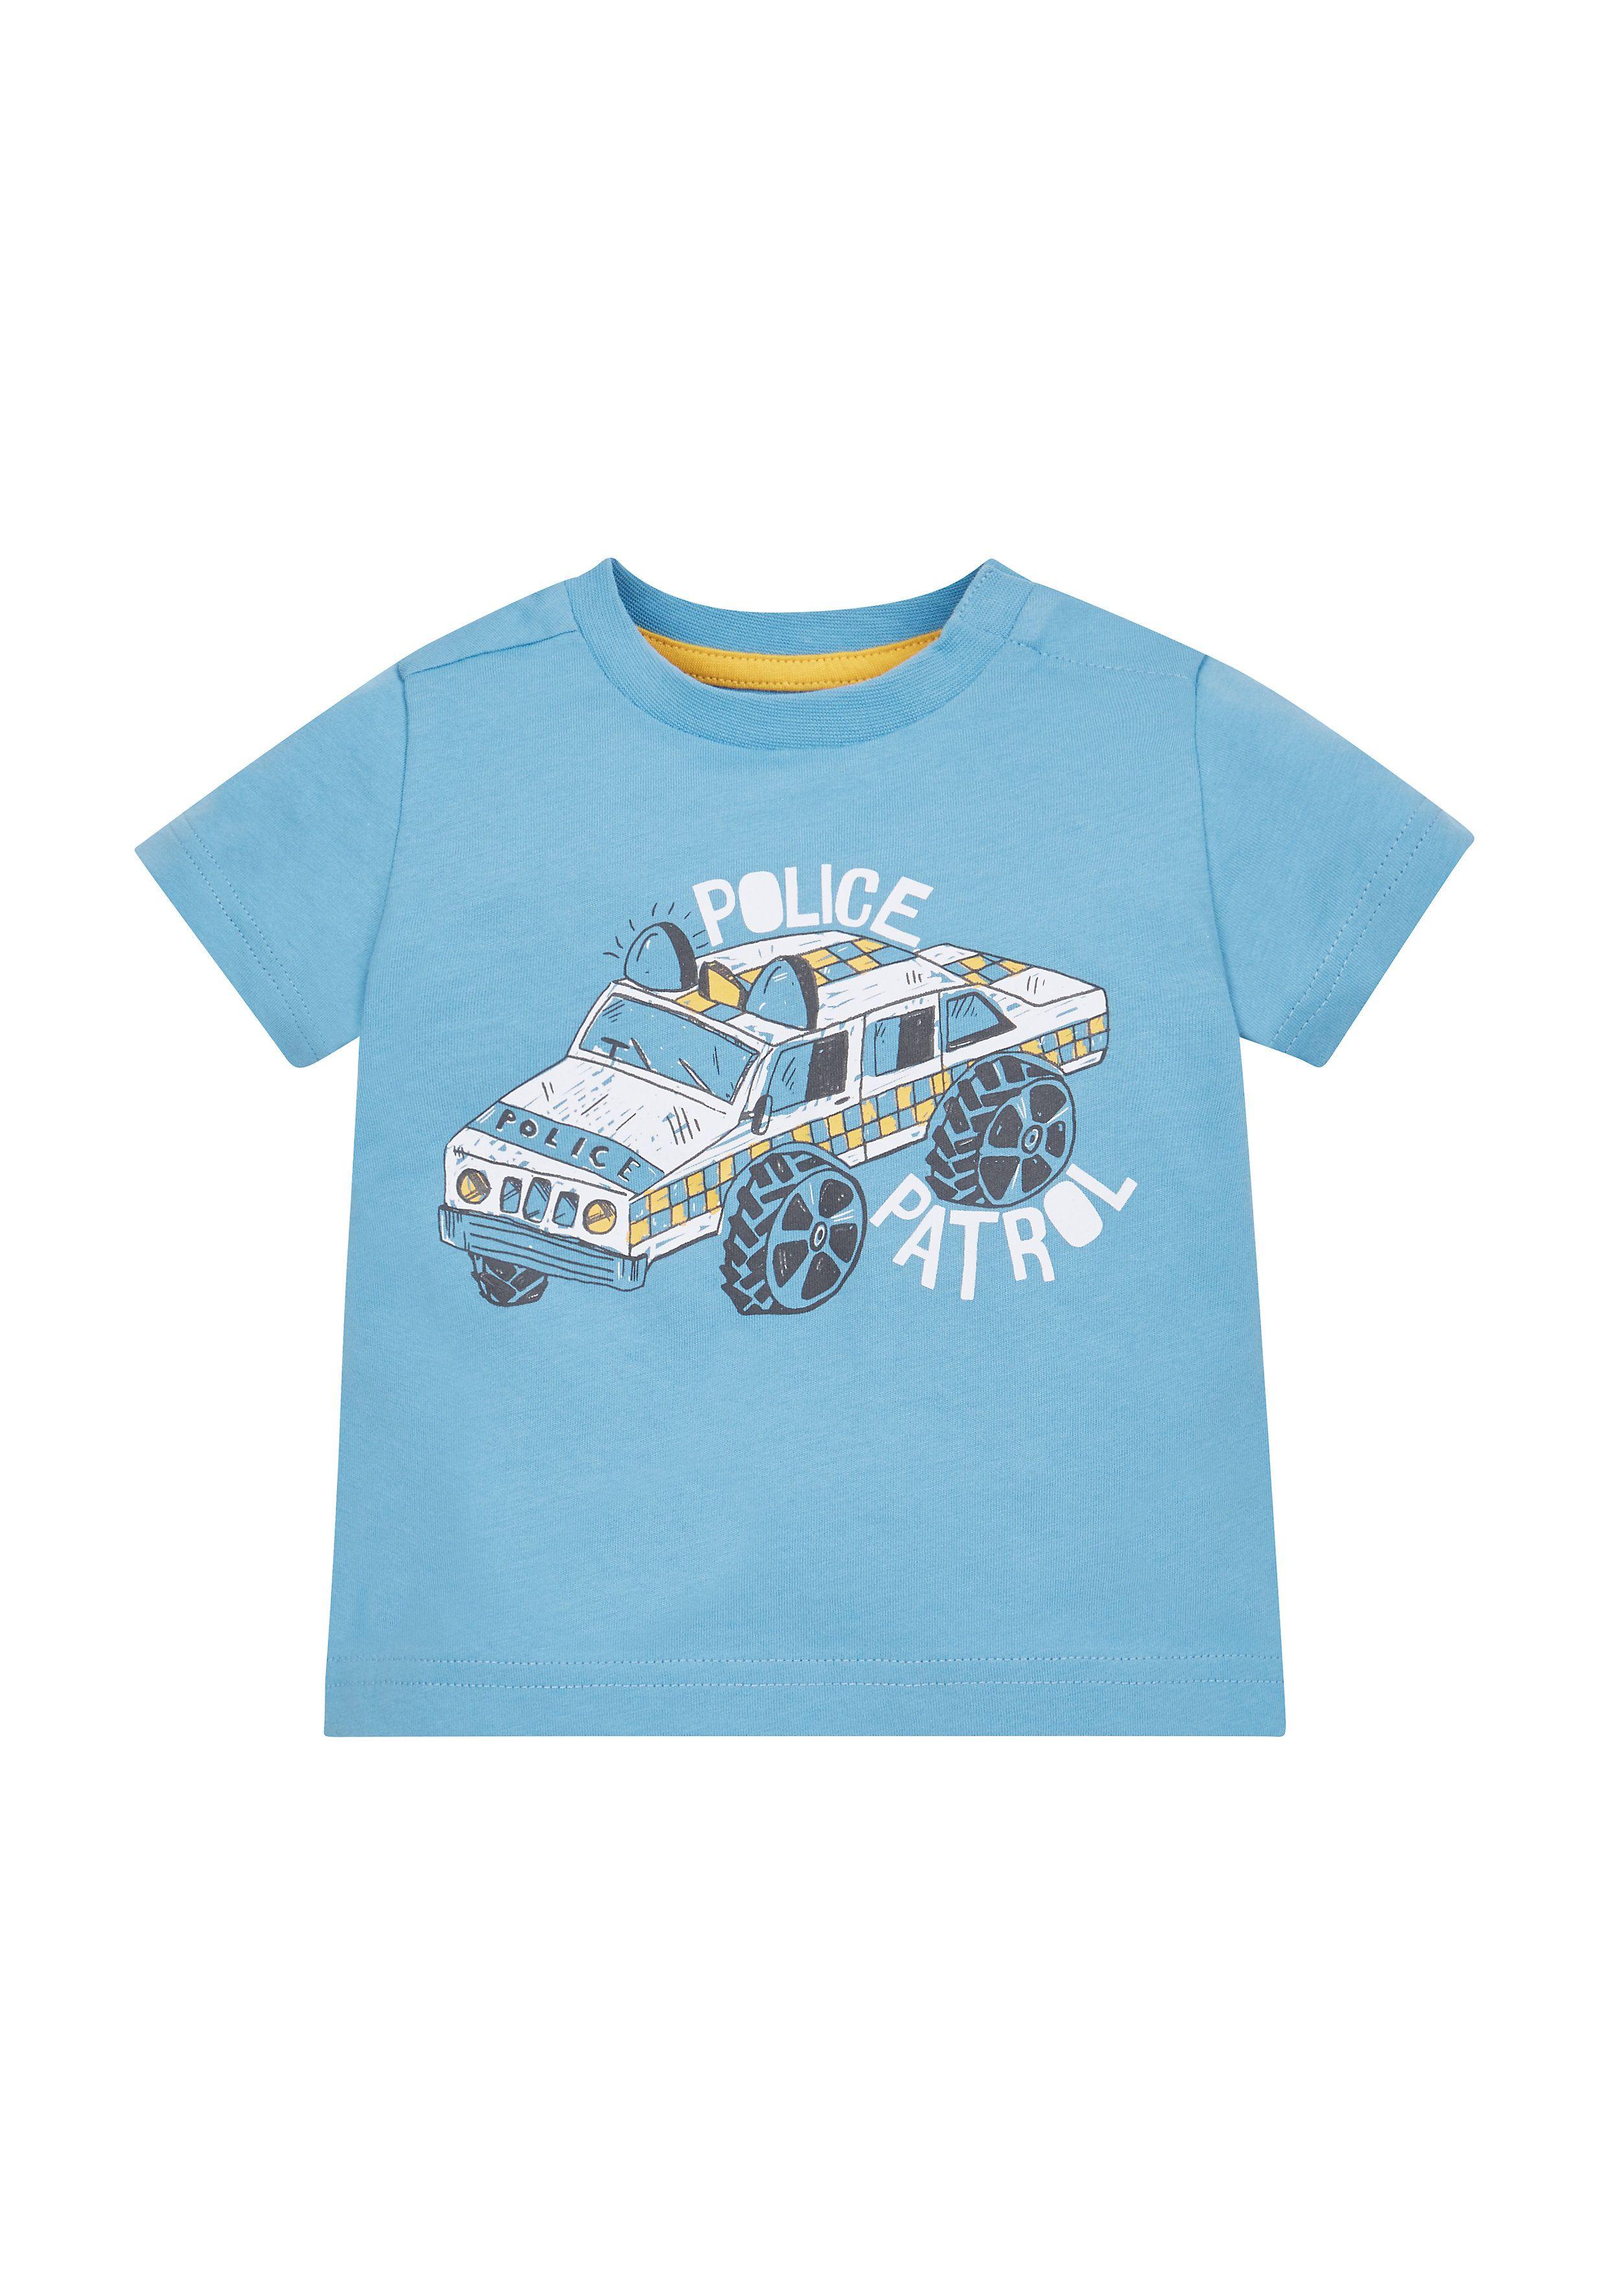 Mothercare   Police Patrol T-Shirt